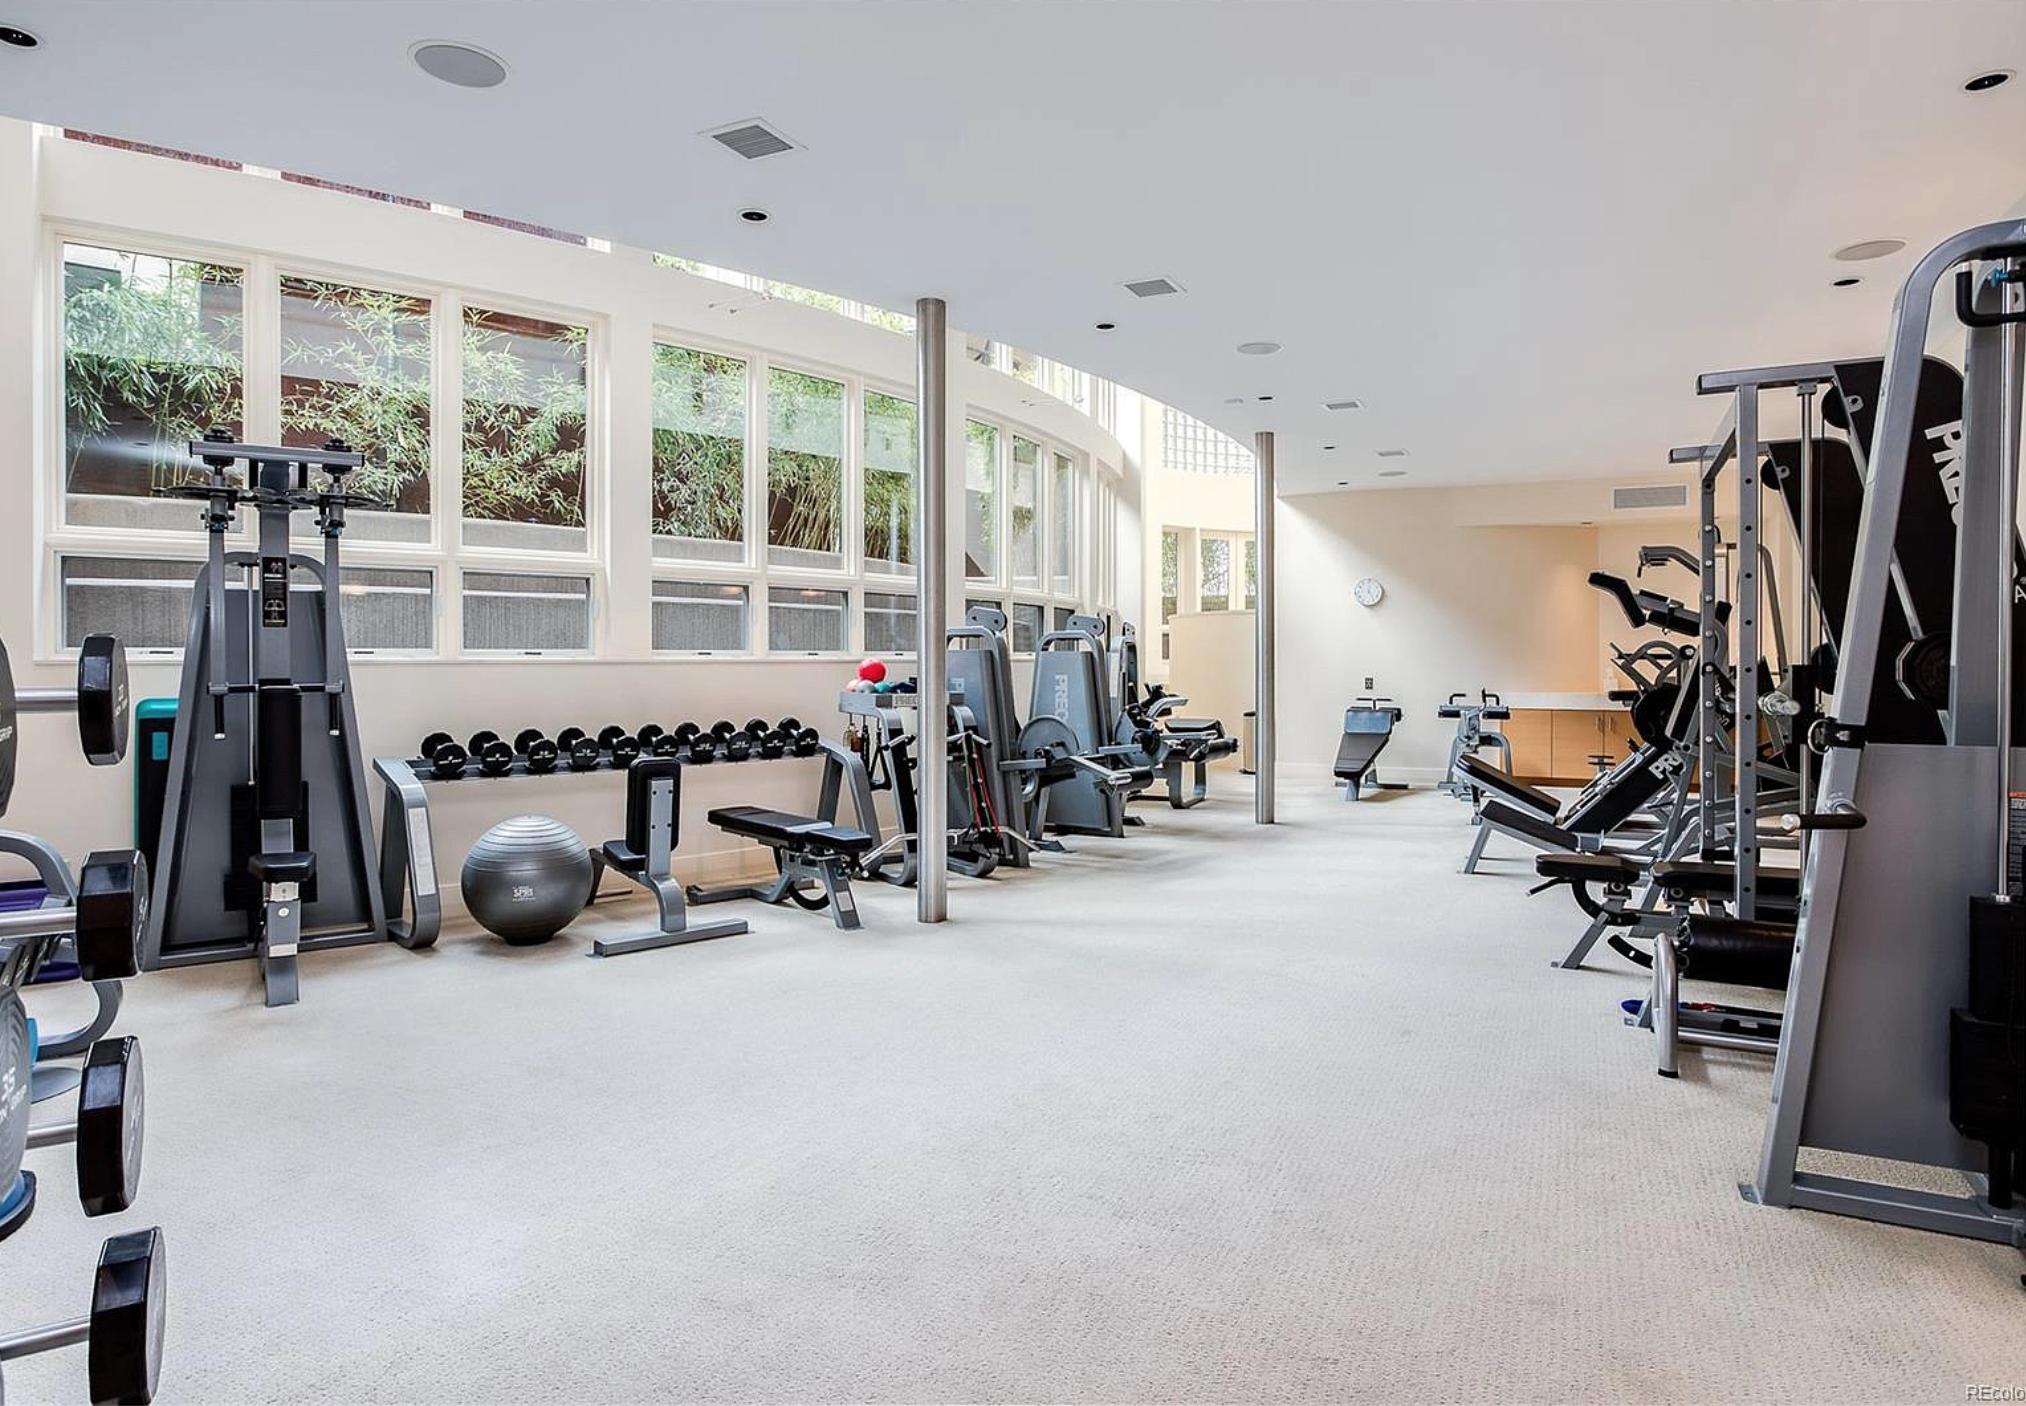 2-level Fitness room